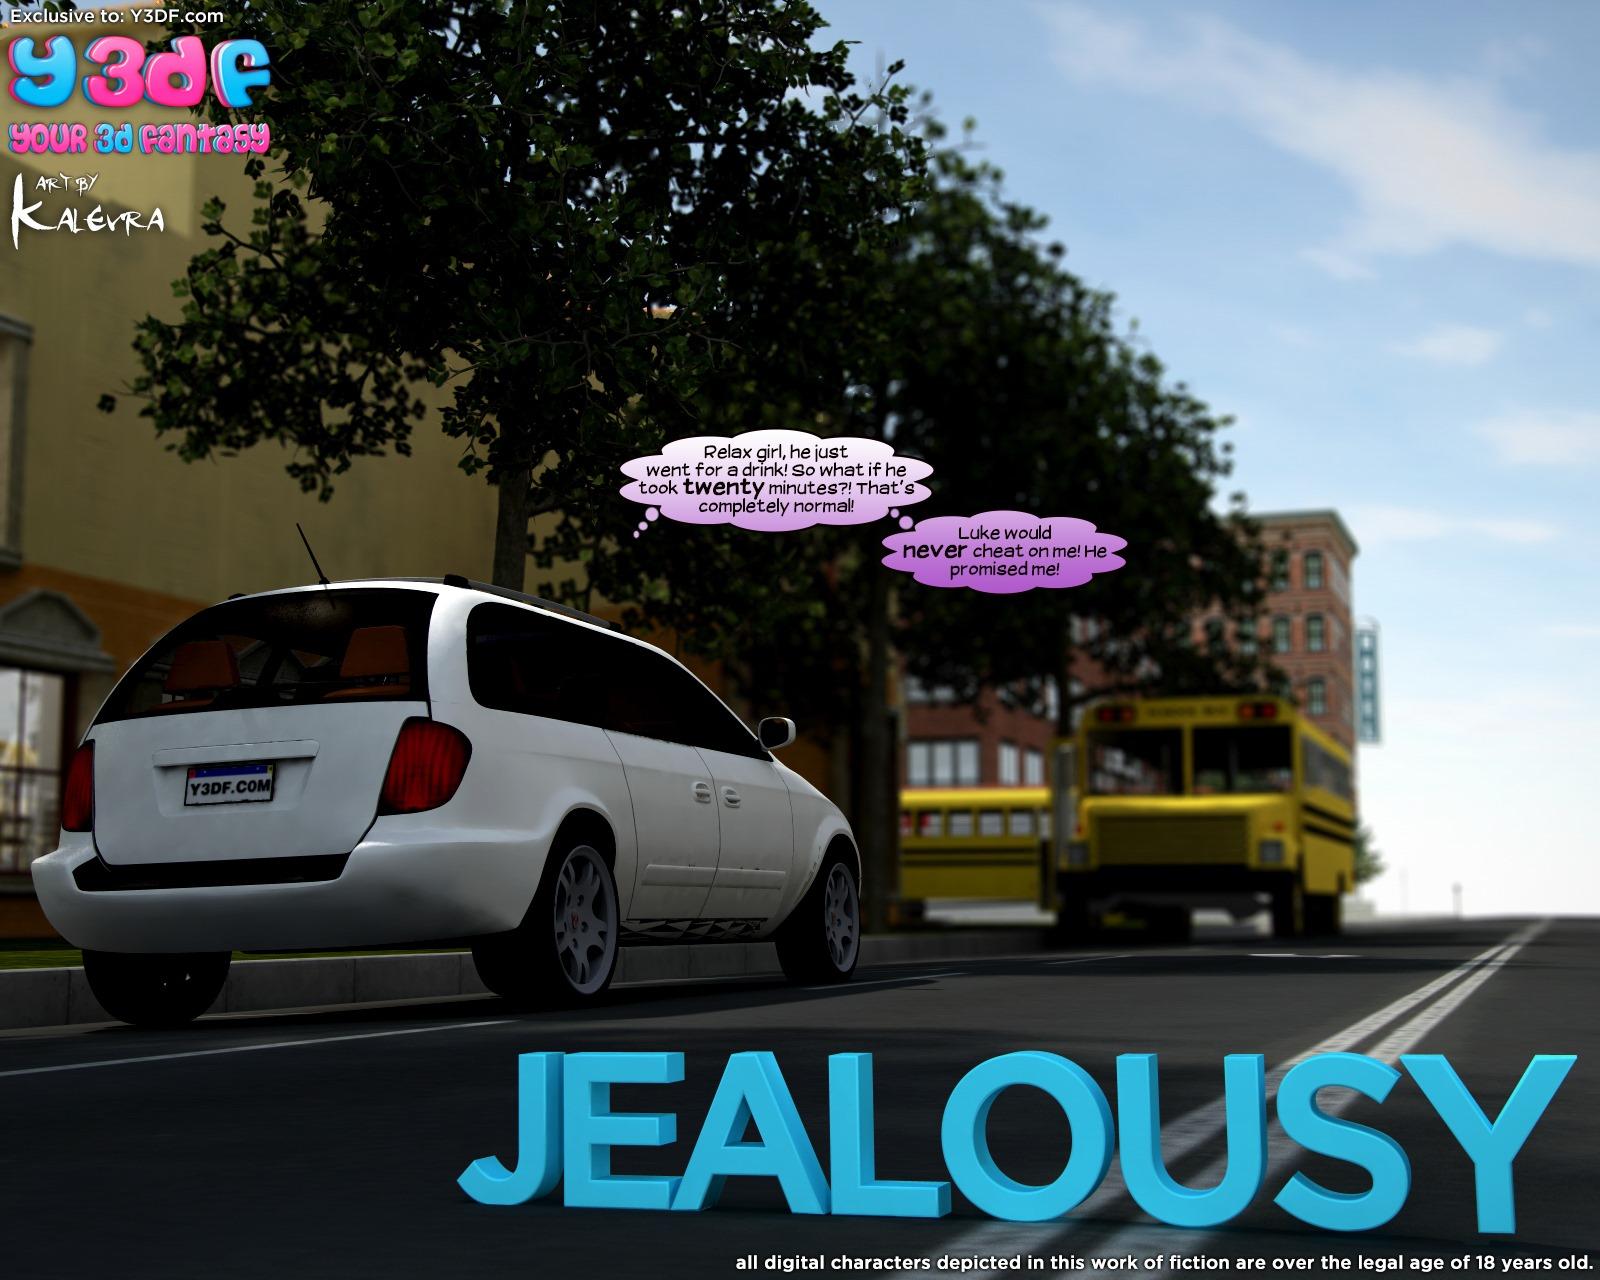 Y3DF – Jealousy porn comics 8 muses